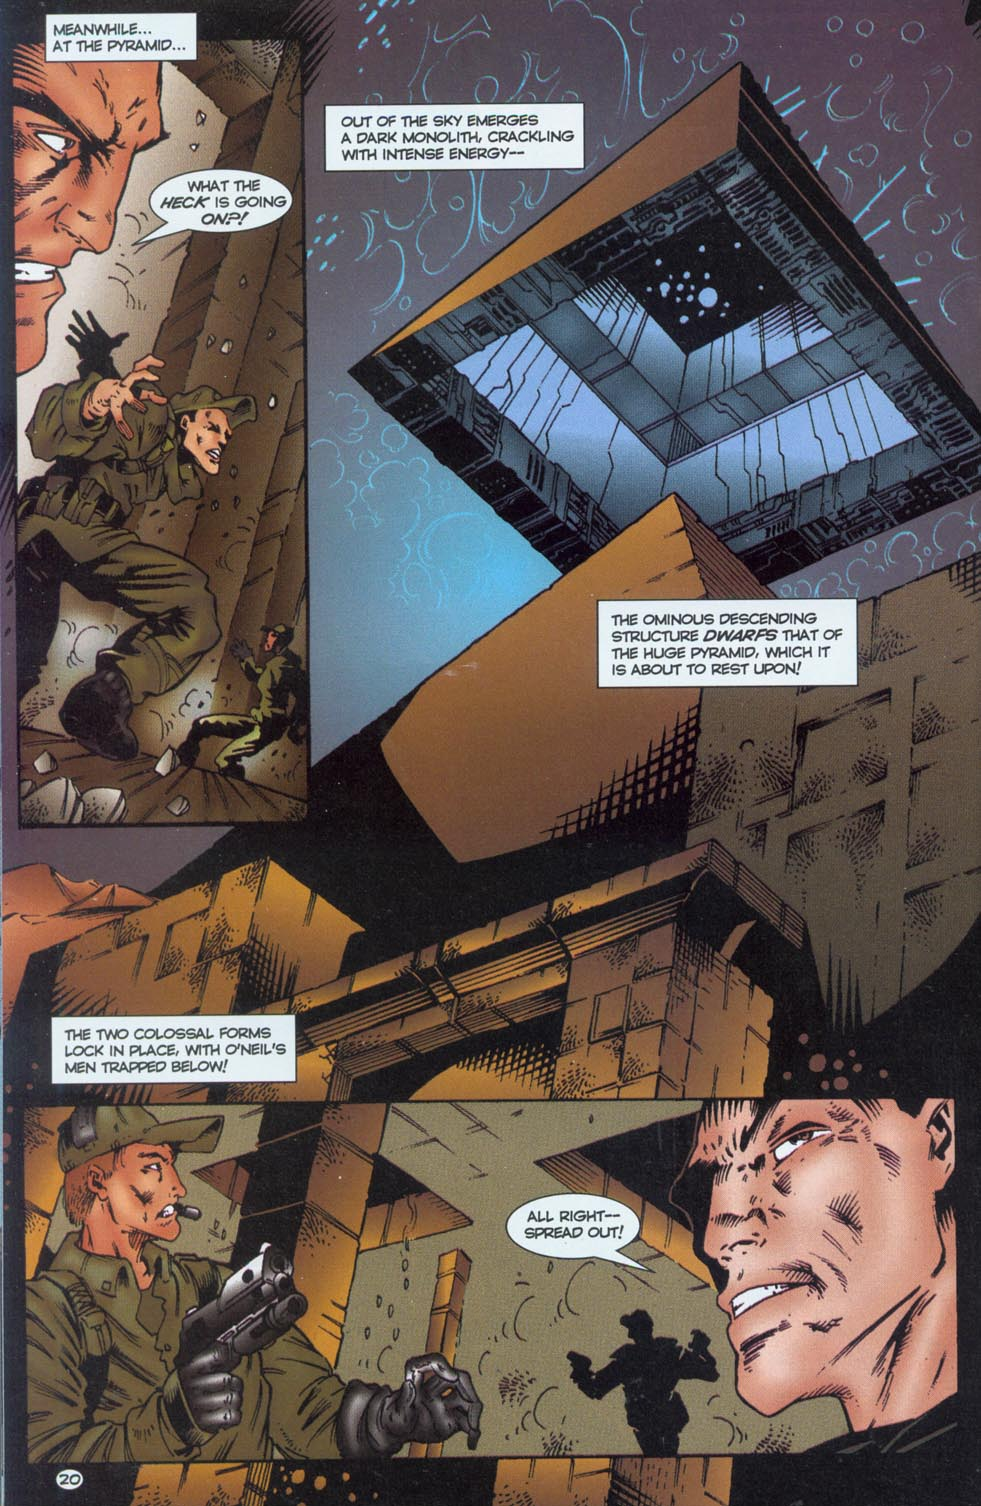 Read online Stargate comic -  Issue #1 - 22